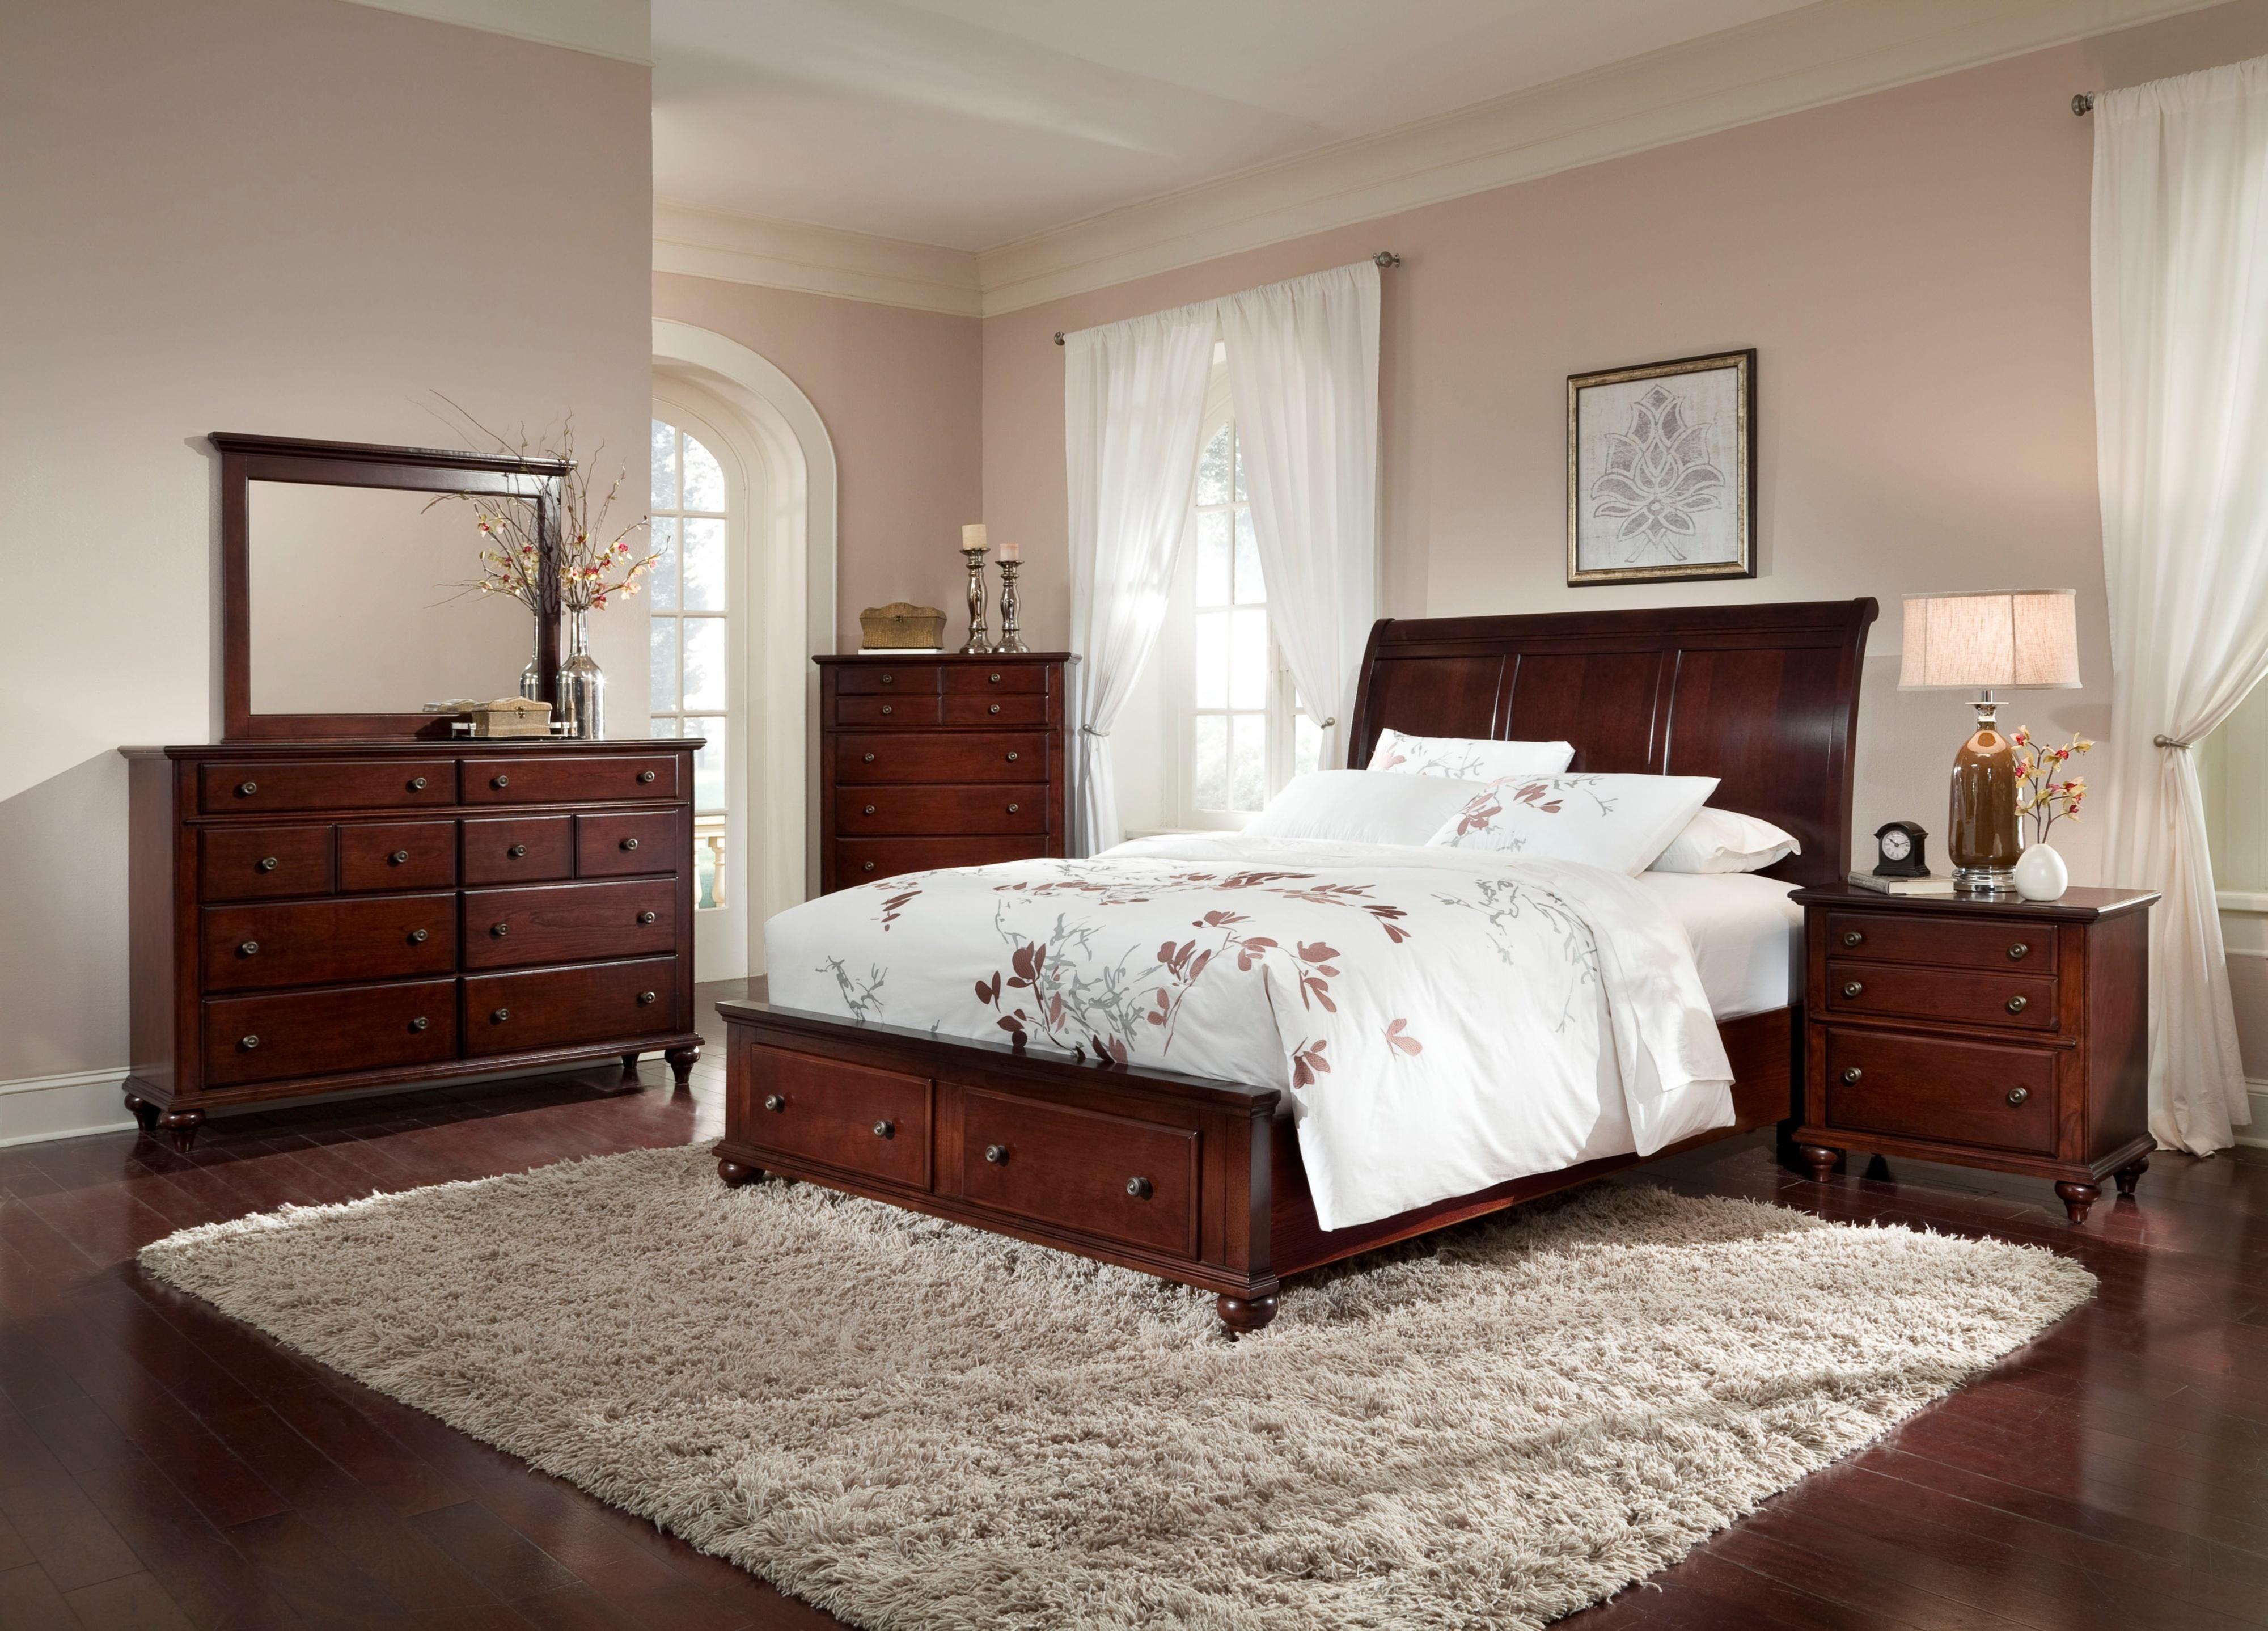 Broyhill Attic Heirlooms 4399 Sleigh Bedroom Set Sleigh Bedroom Set Heirloom Furniture Bedroom Set